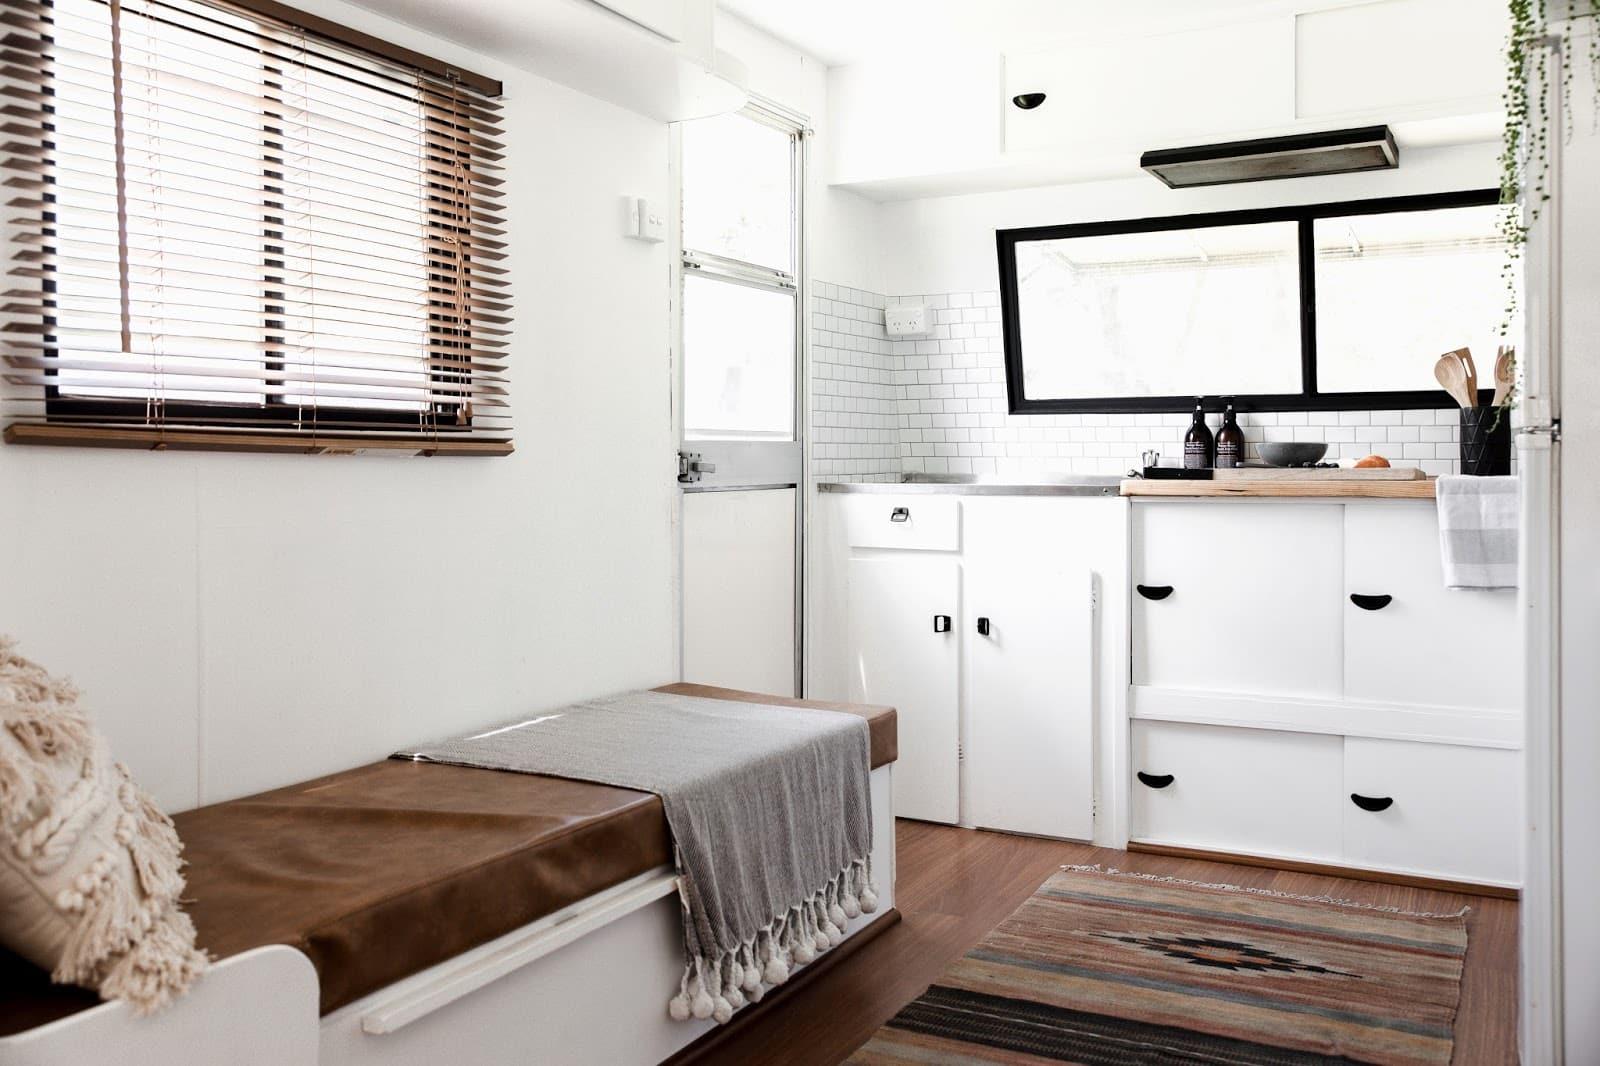 Super Ollie Caravan Windsor Statesman 27 Living In A Shoebox Ibusinesslaw Wood Chair Design Ideas Ibusinesslaworg